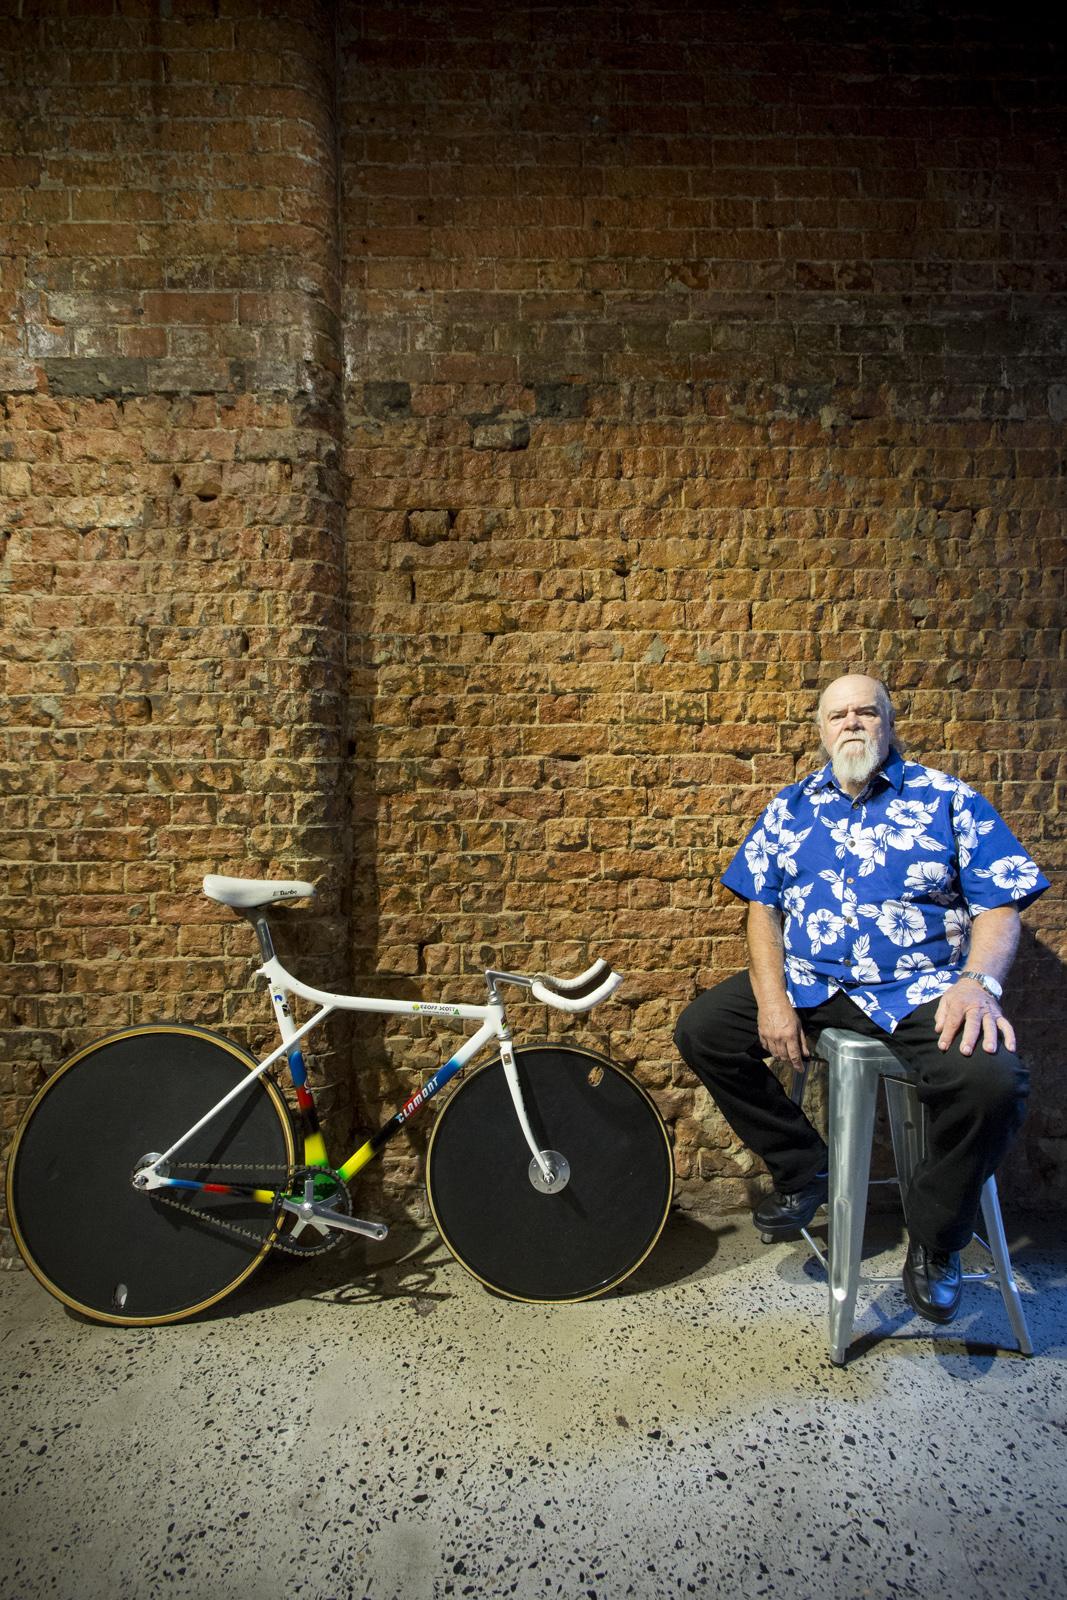 CSC-clarence street cyclery_014811 lane room bricks bike maker.jpg